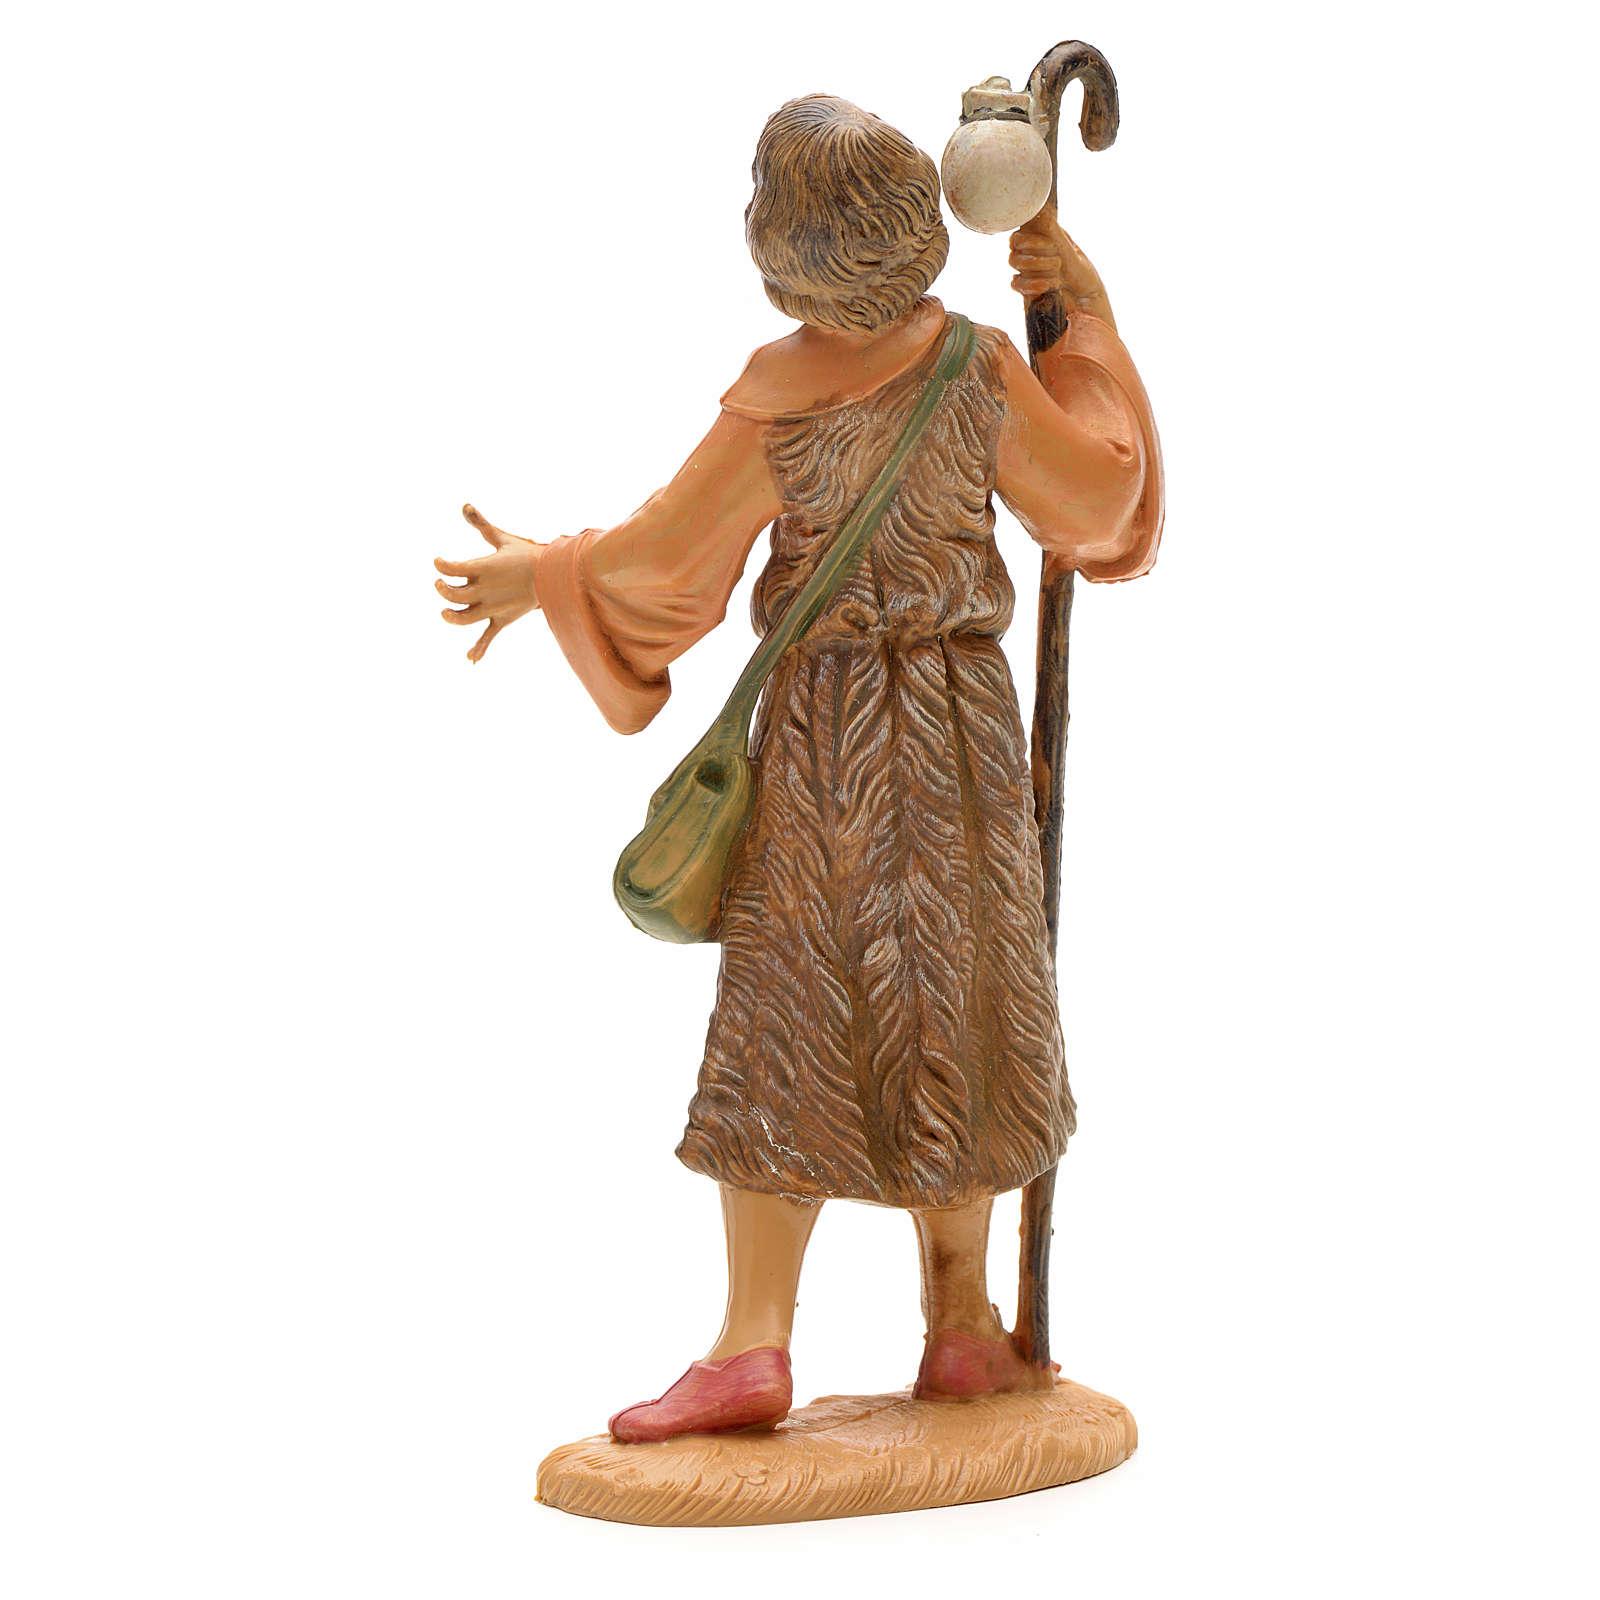 Berger avec bâton et sac crèche Fontanini 12 cm 4